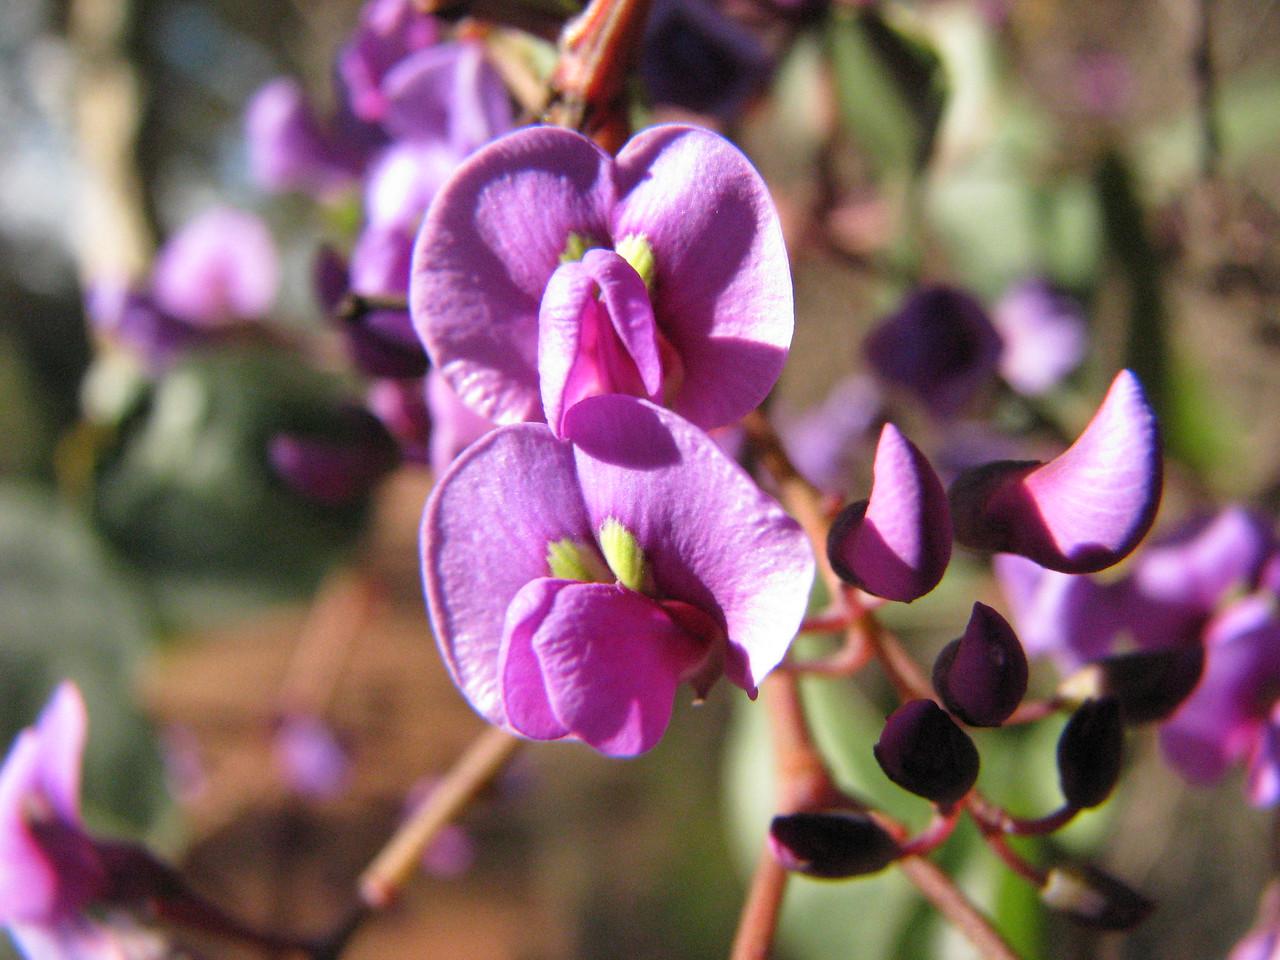 Hardenbergia violaceae / False Sarsparilla  Climber / Scrambler with showy purple flowers Nov - Jul